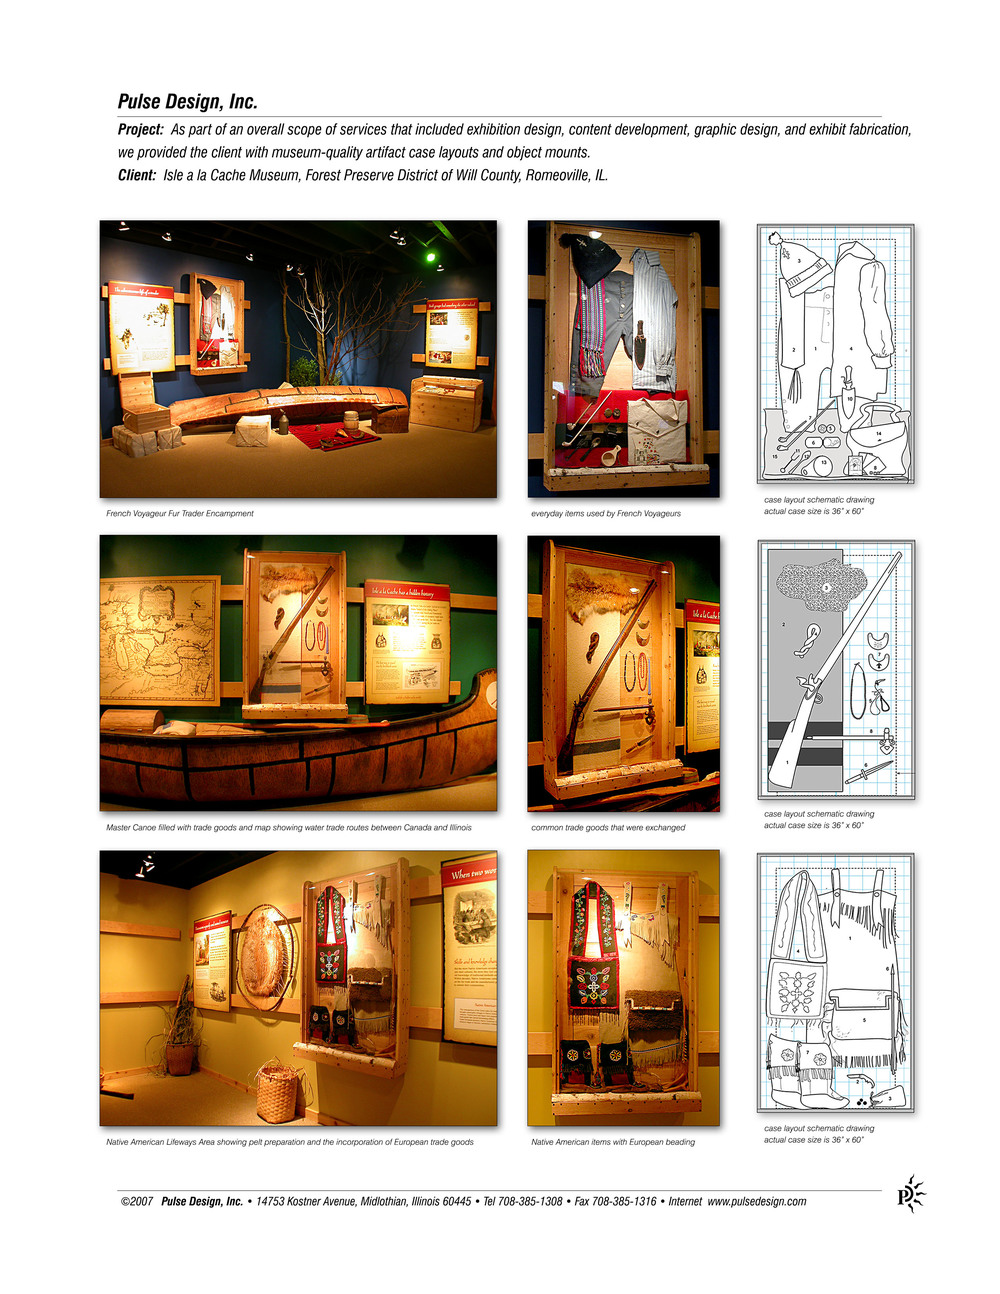 Isla-a-la-Cache-Exhibit-Case-Layouts-Pulse-Design-Inc.jpg